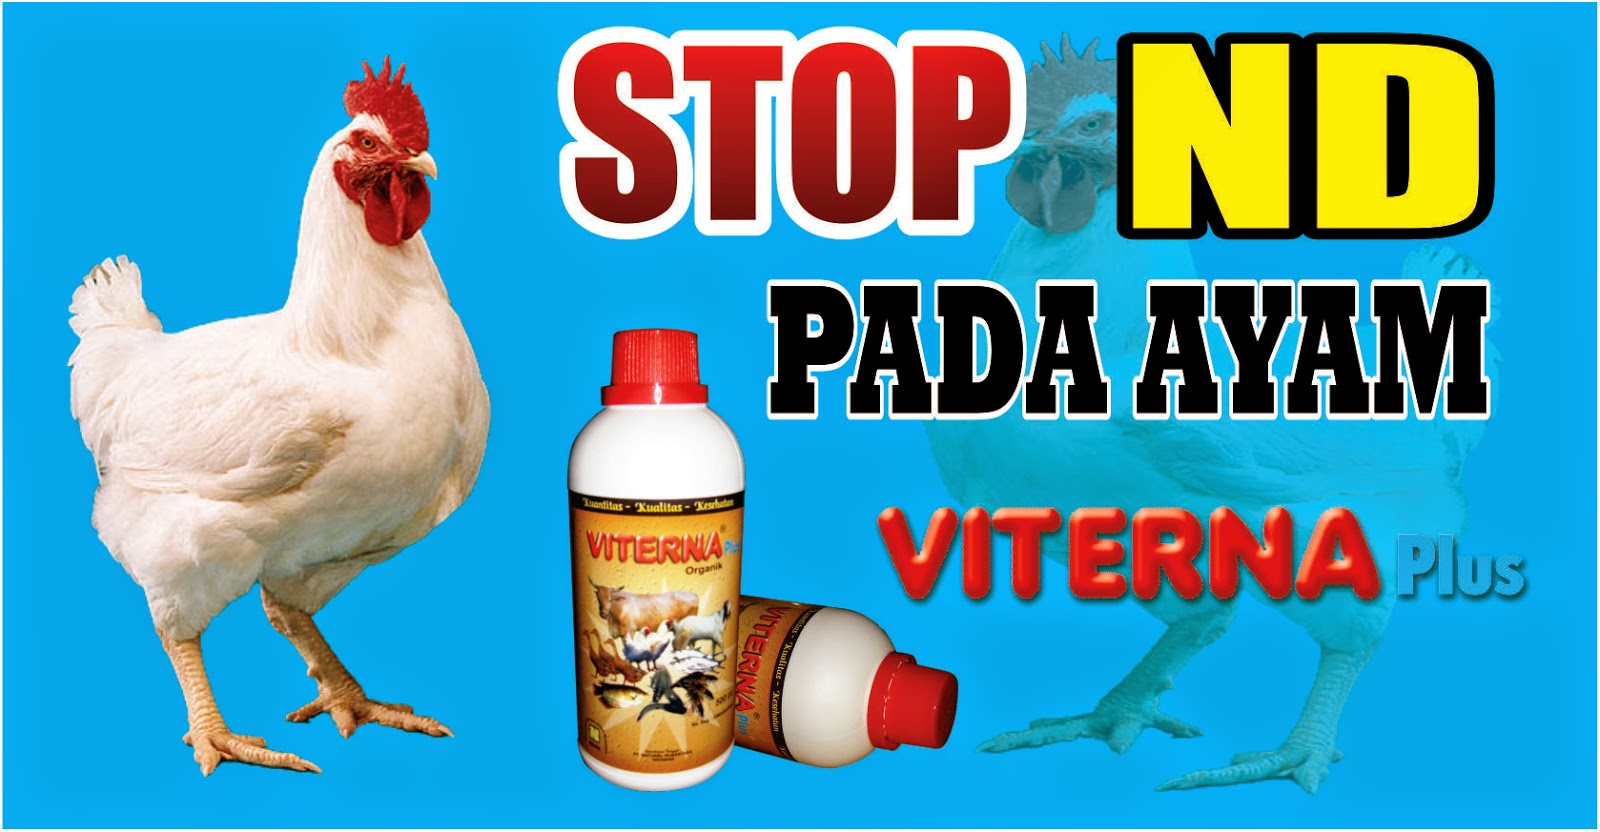 Keunggulan Viterna mencegah penyakit ND pada ayam